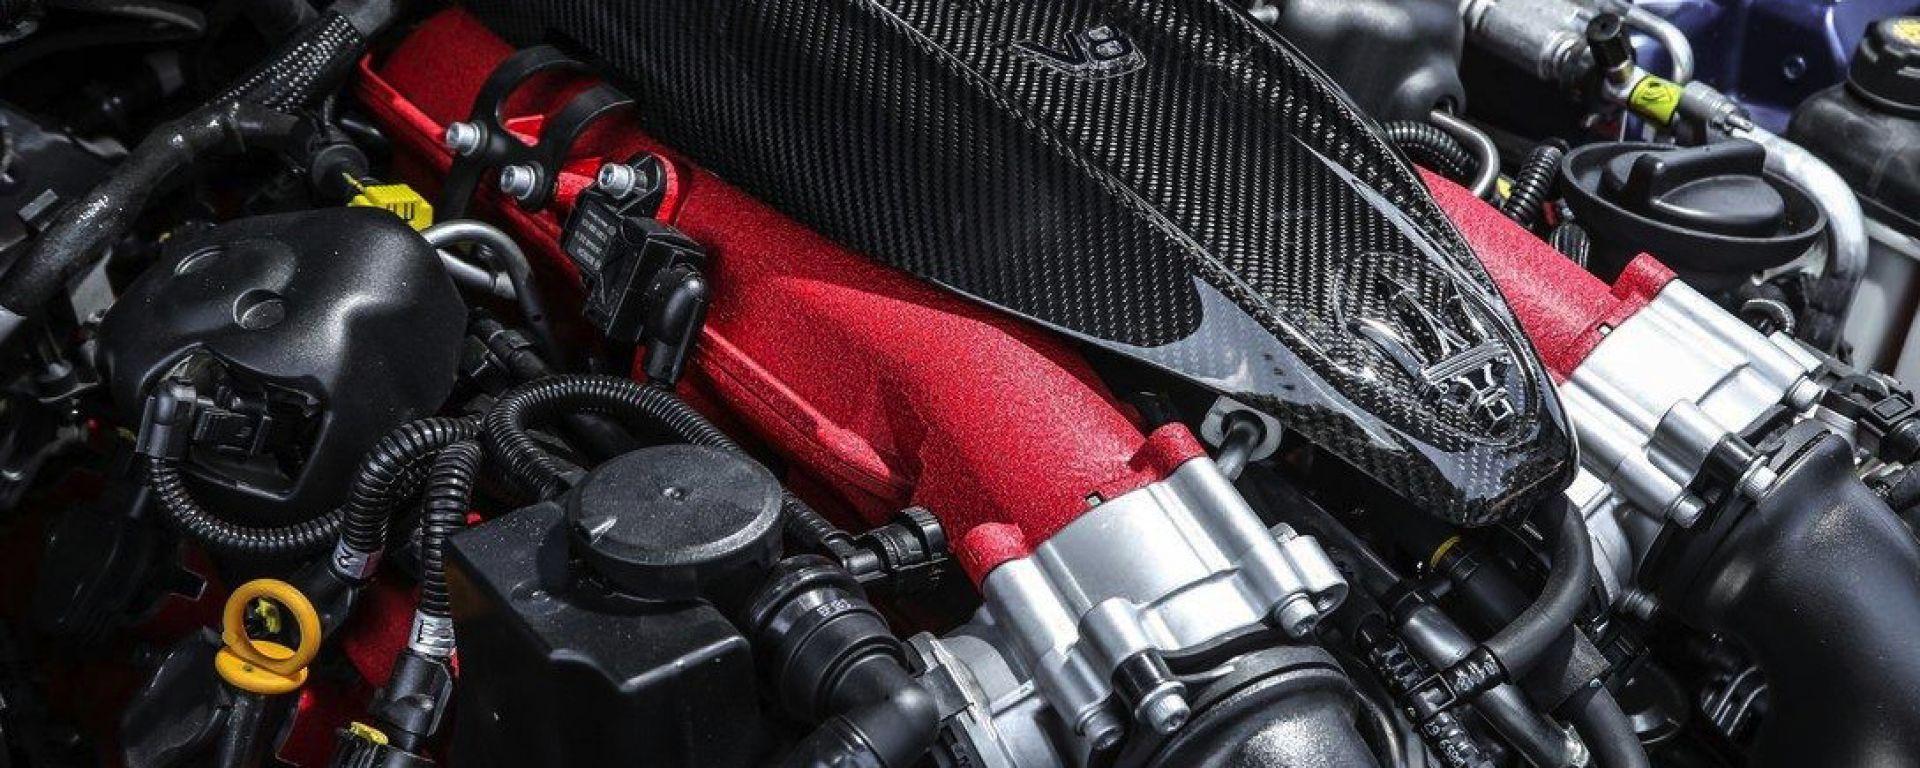 Motore 3,8 litri biturbo V-8 creato da Ferrari per Maserati